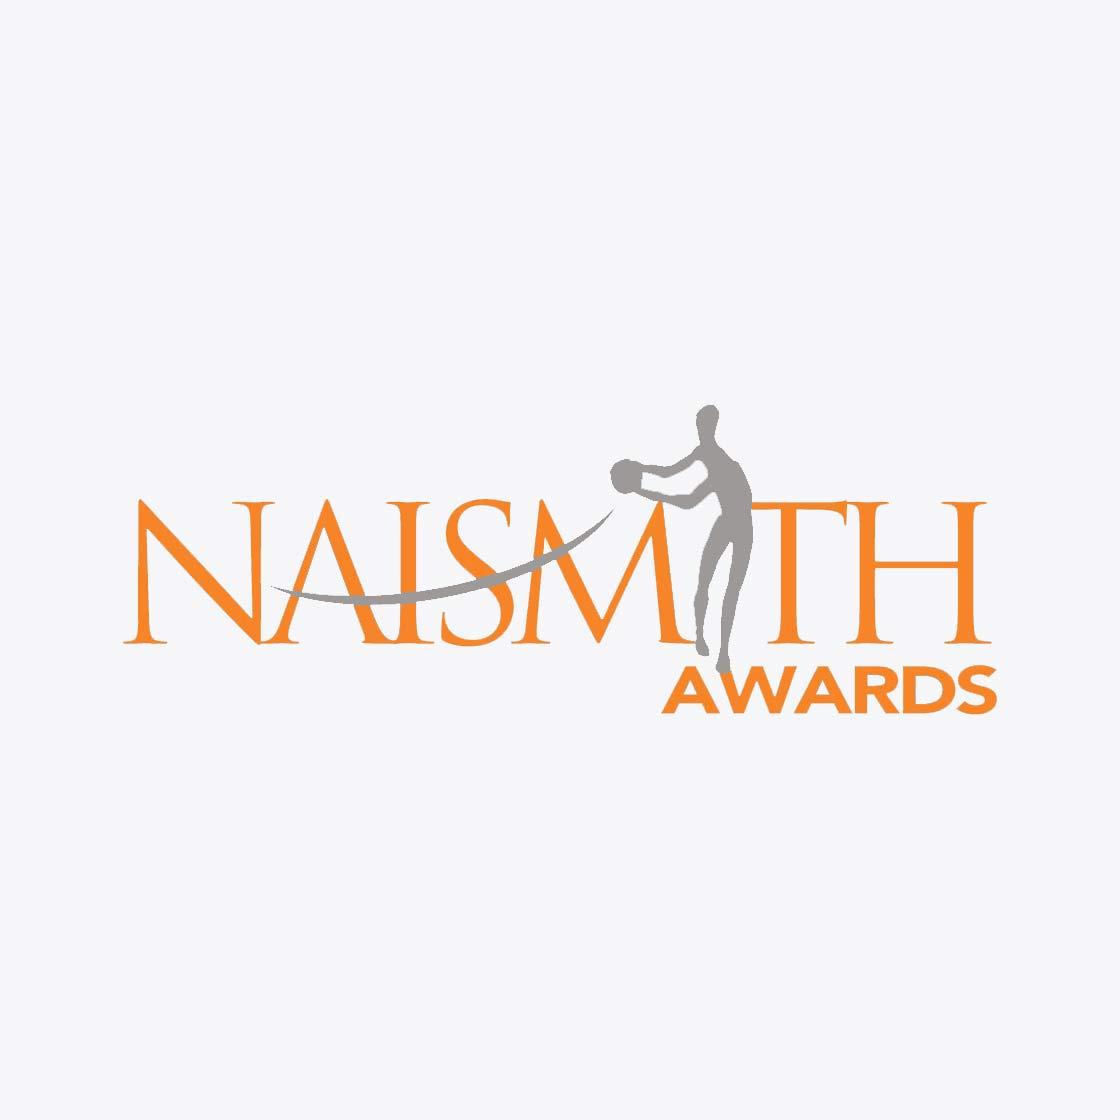 naismith